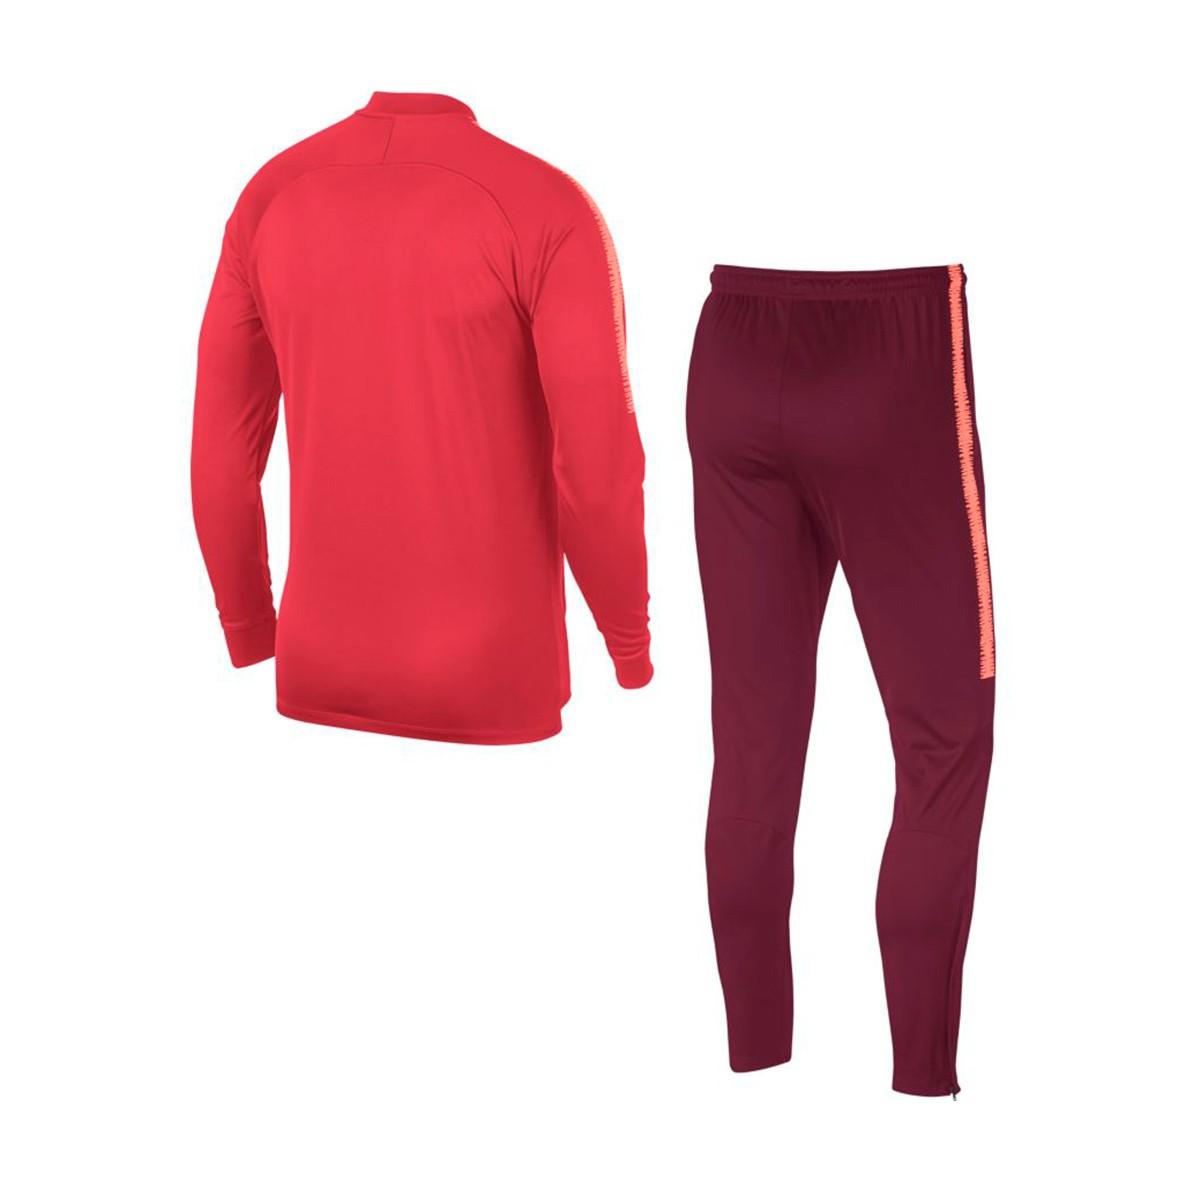 Fato de treino Nike FC Barcelona Squad 2018-2019 Tropical pink-Deep  maroon-Light atomic pink - Loja de futebol Fútbol Emotion 2046597bc5